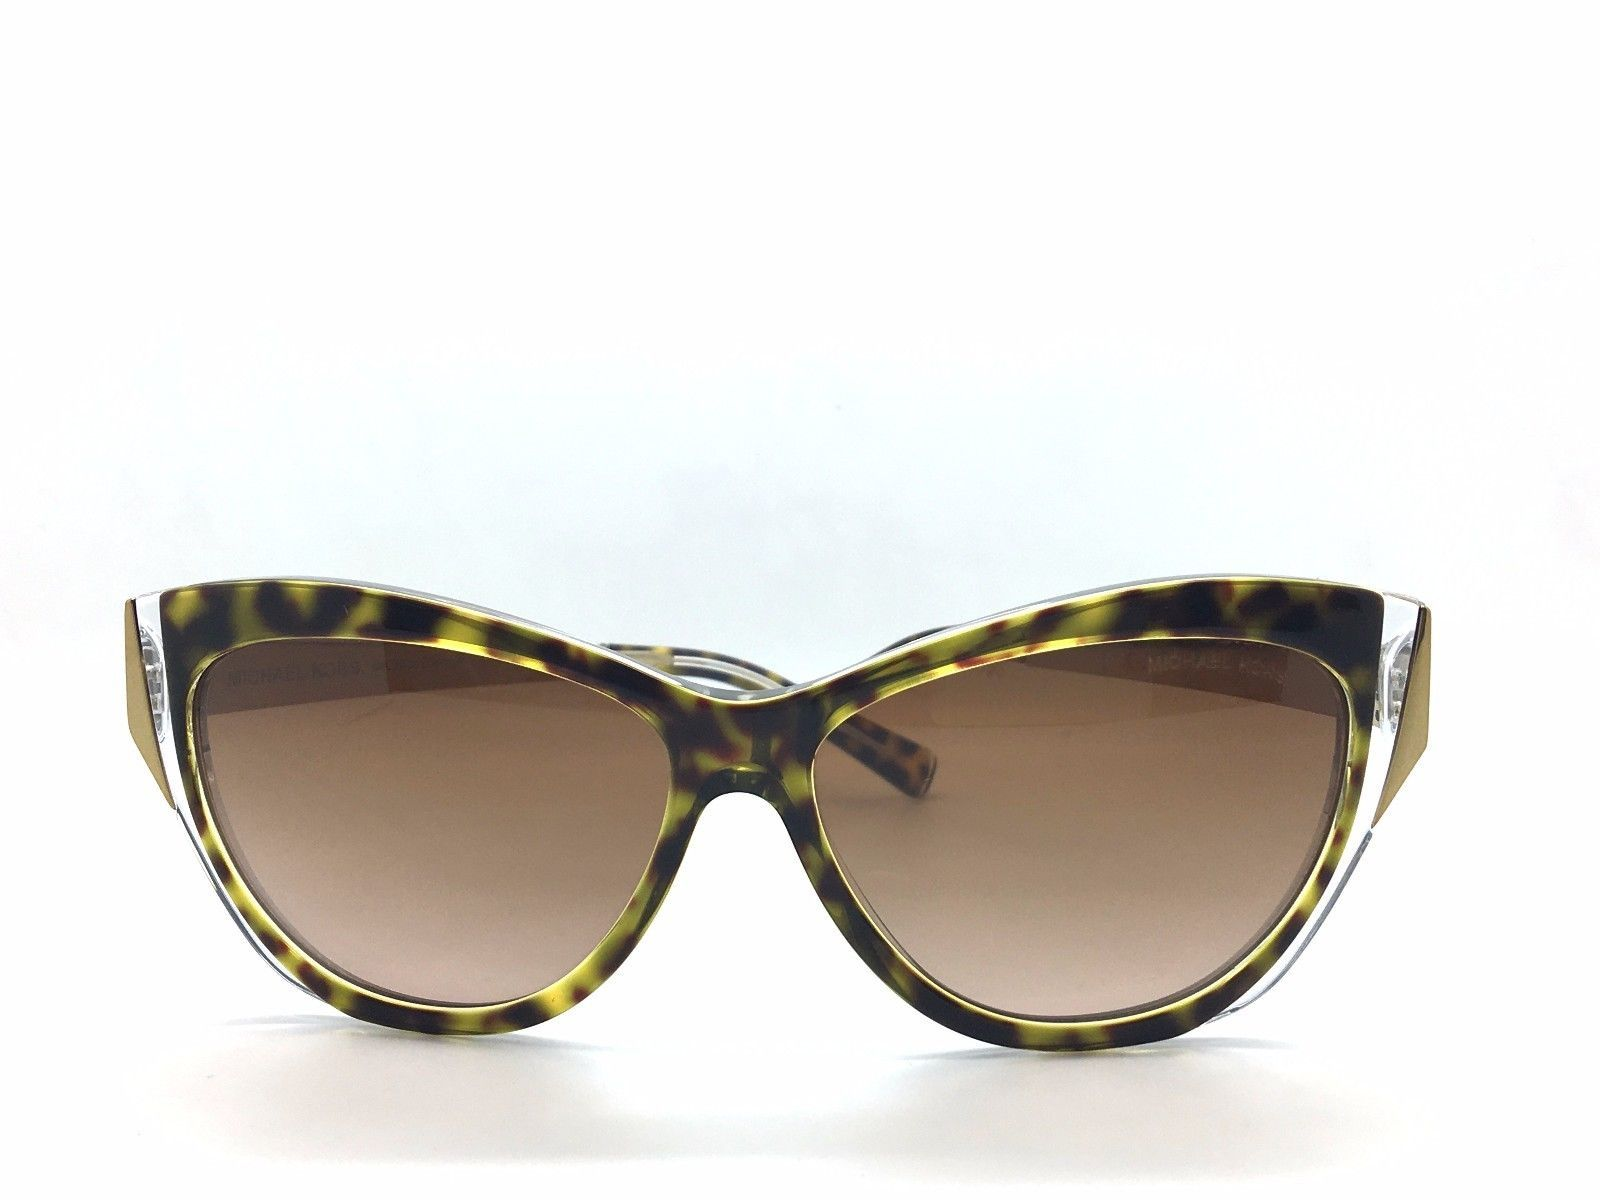 76e3b357b3762 Michael Kors MK 2005 303413 Caneel Tortoise Crystal New Authentic Sunglasses